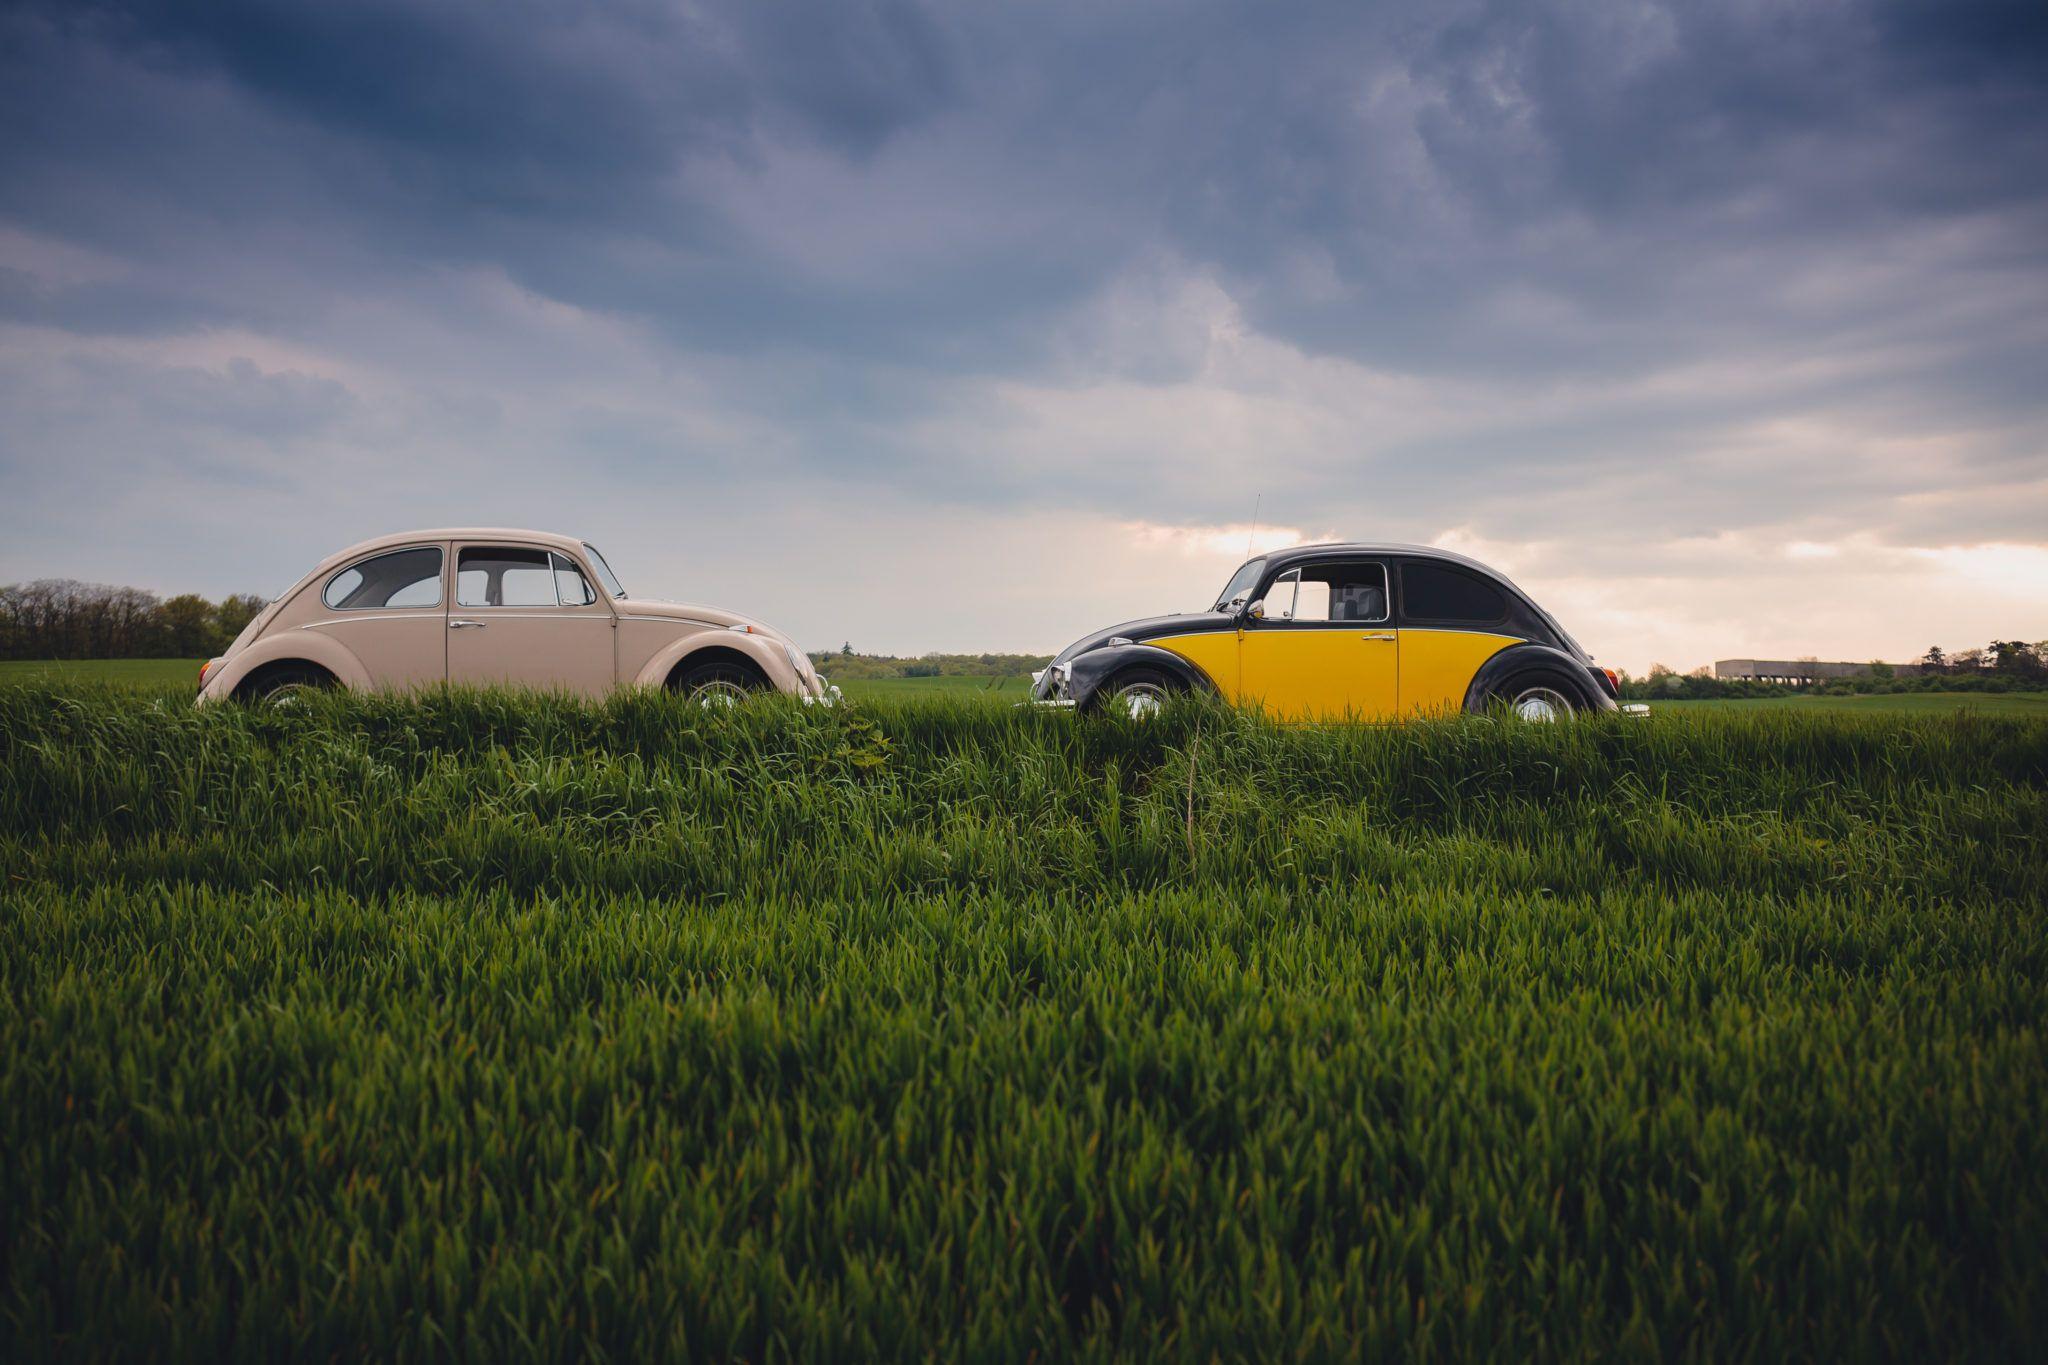 Two VW bugs head to head in a grassy field